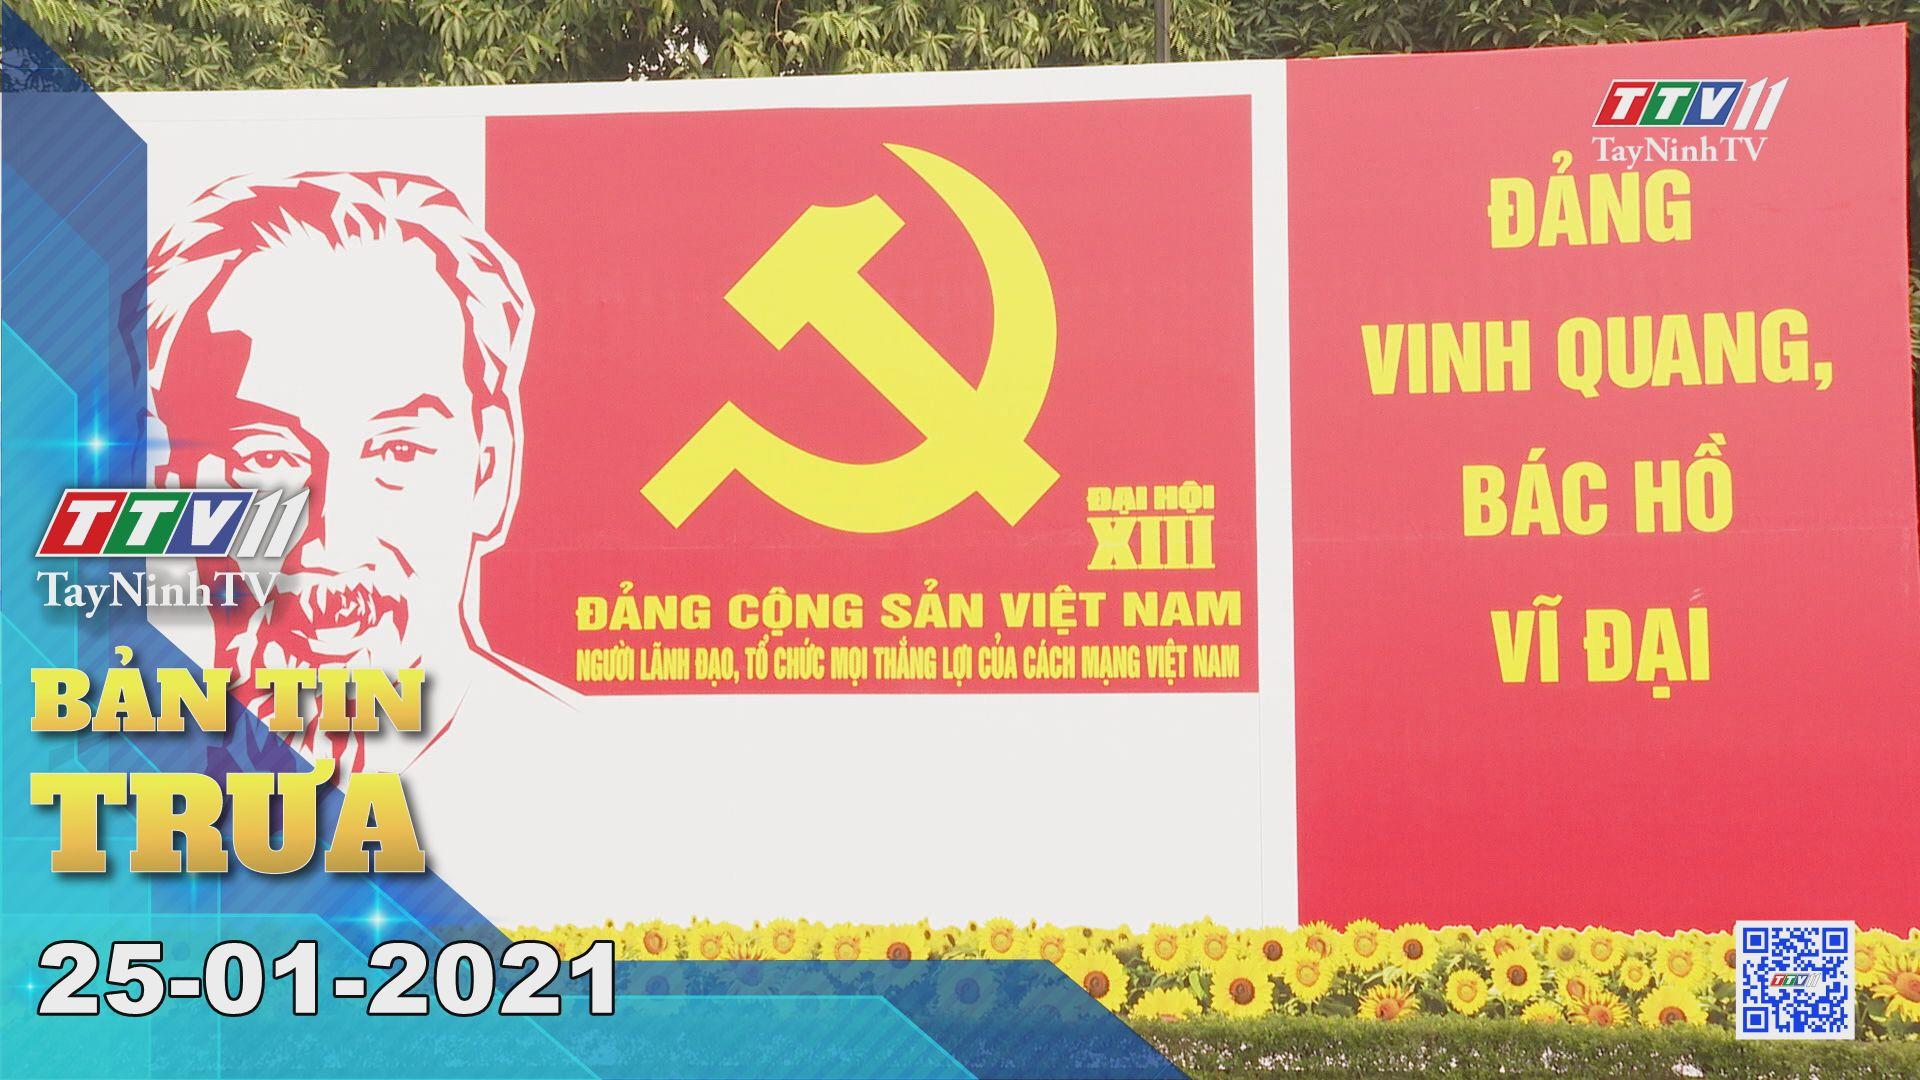 Bản tin trưa 25-01-2021 | Tin tức hôm nay | TayNinhTV